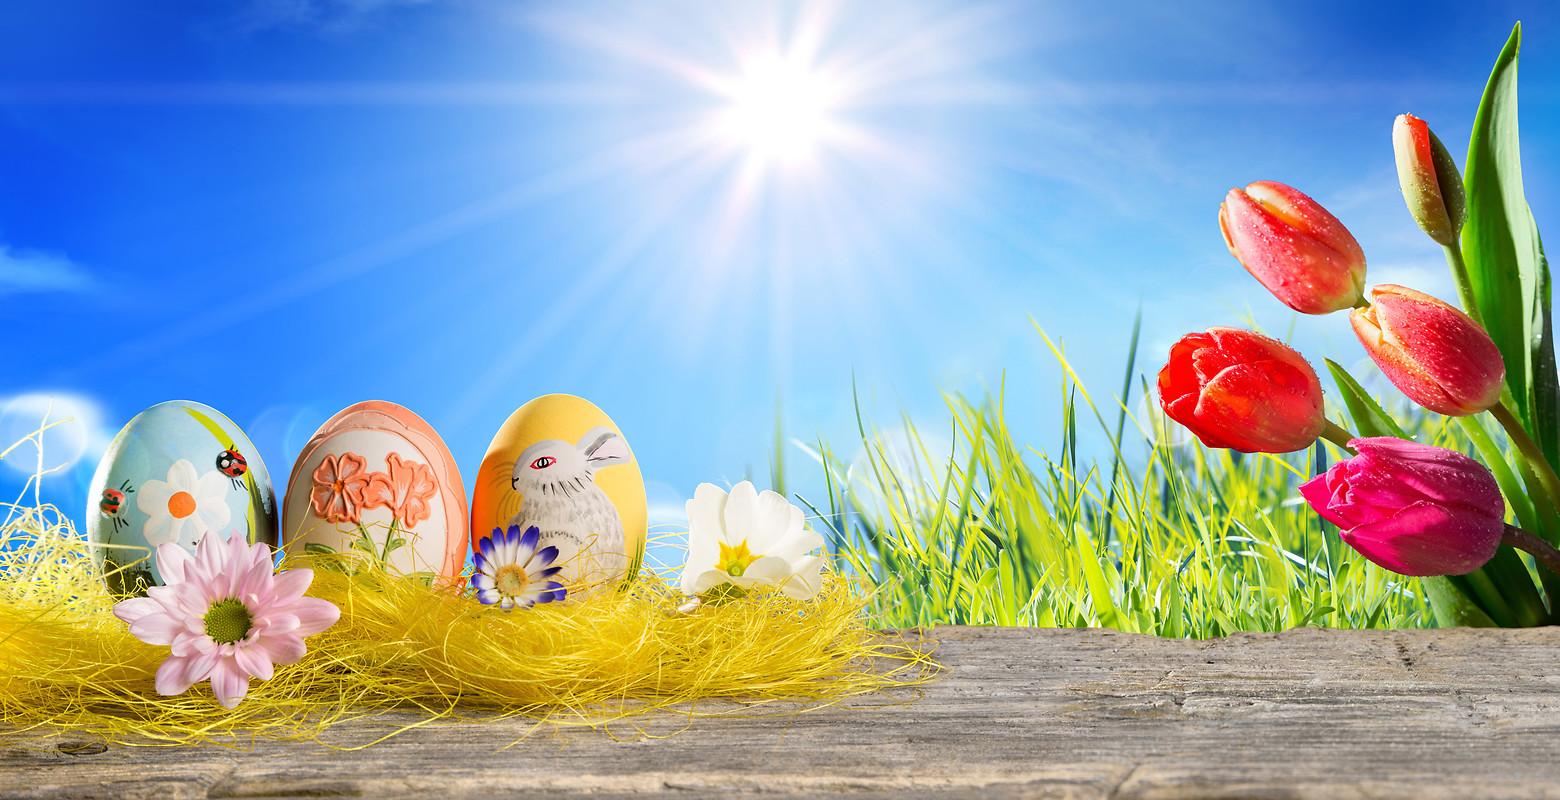 easter eggs HD Wallpaper 9504 1920x1080